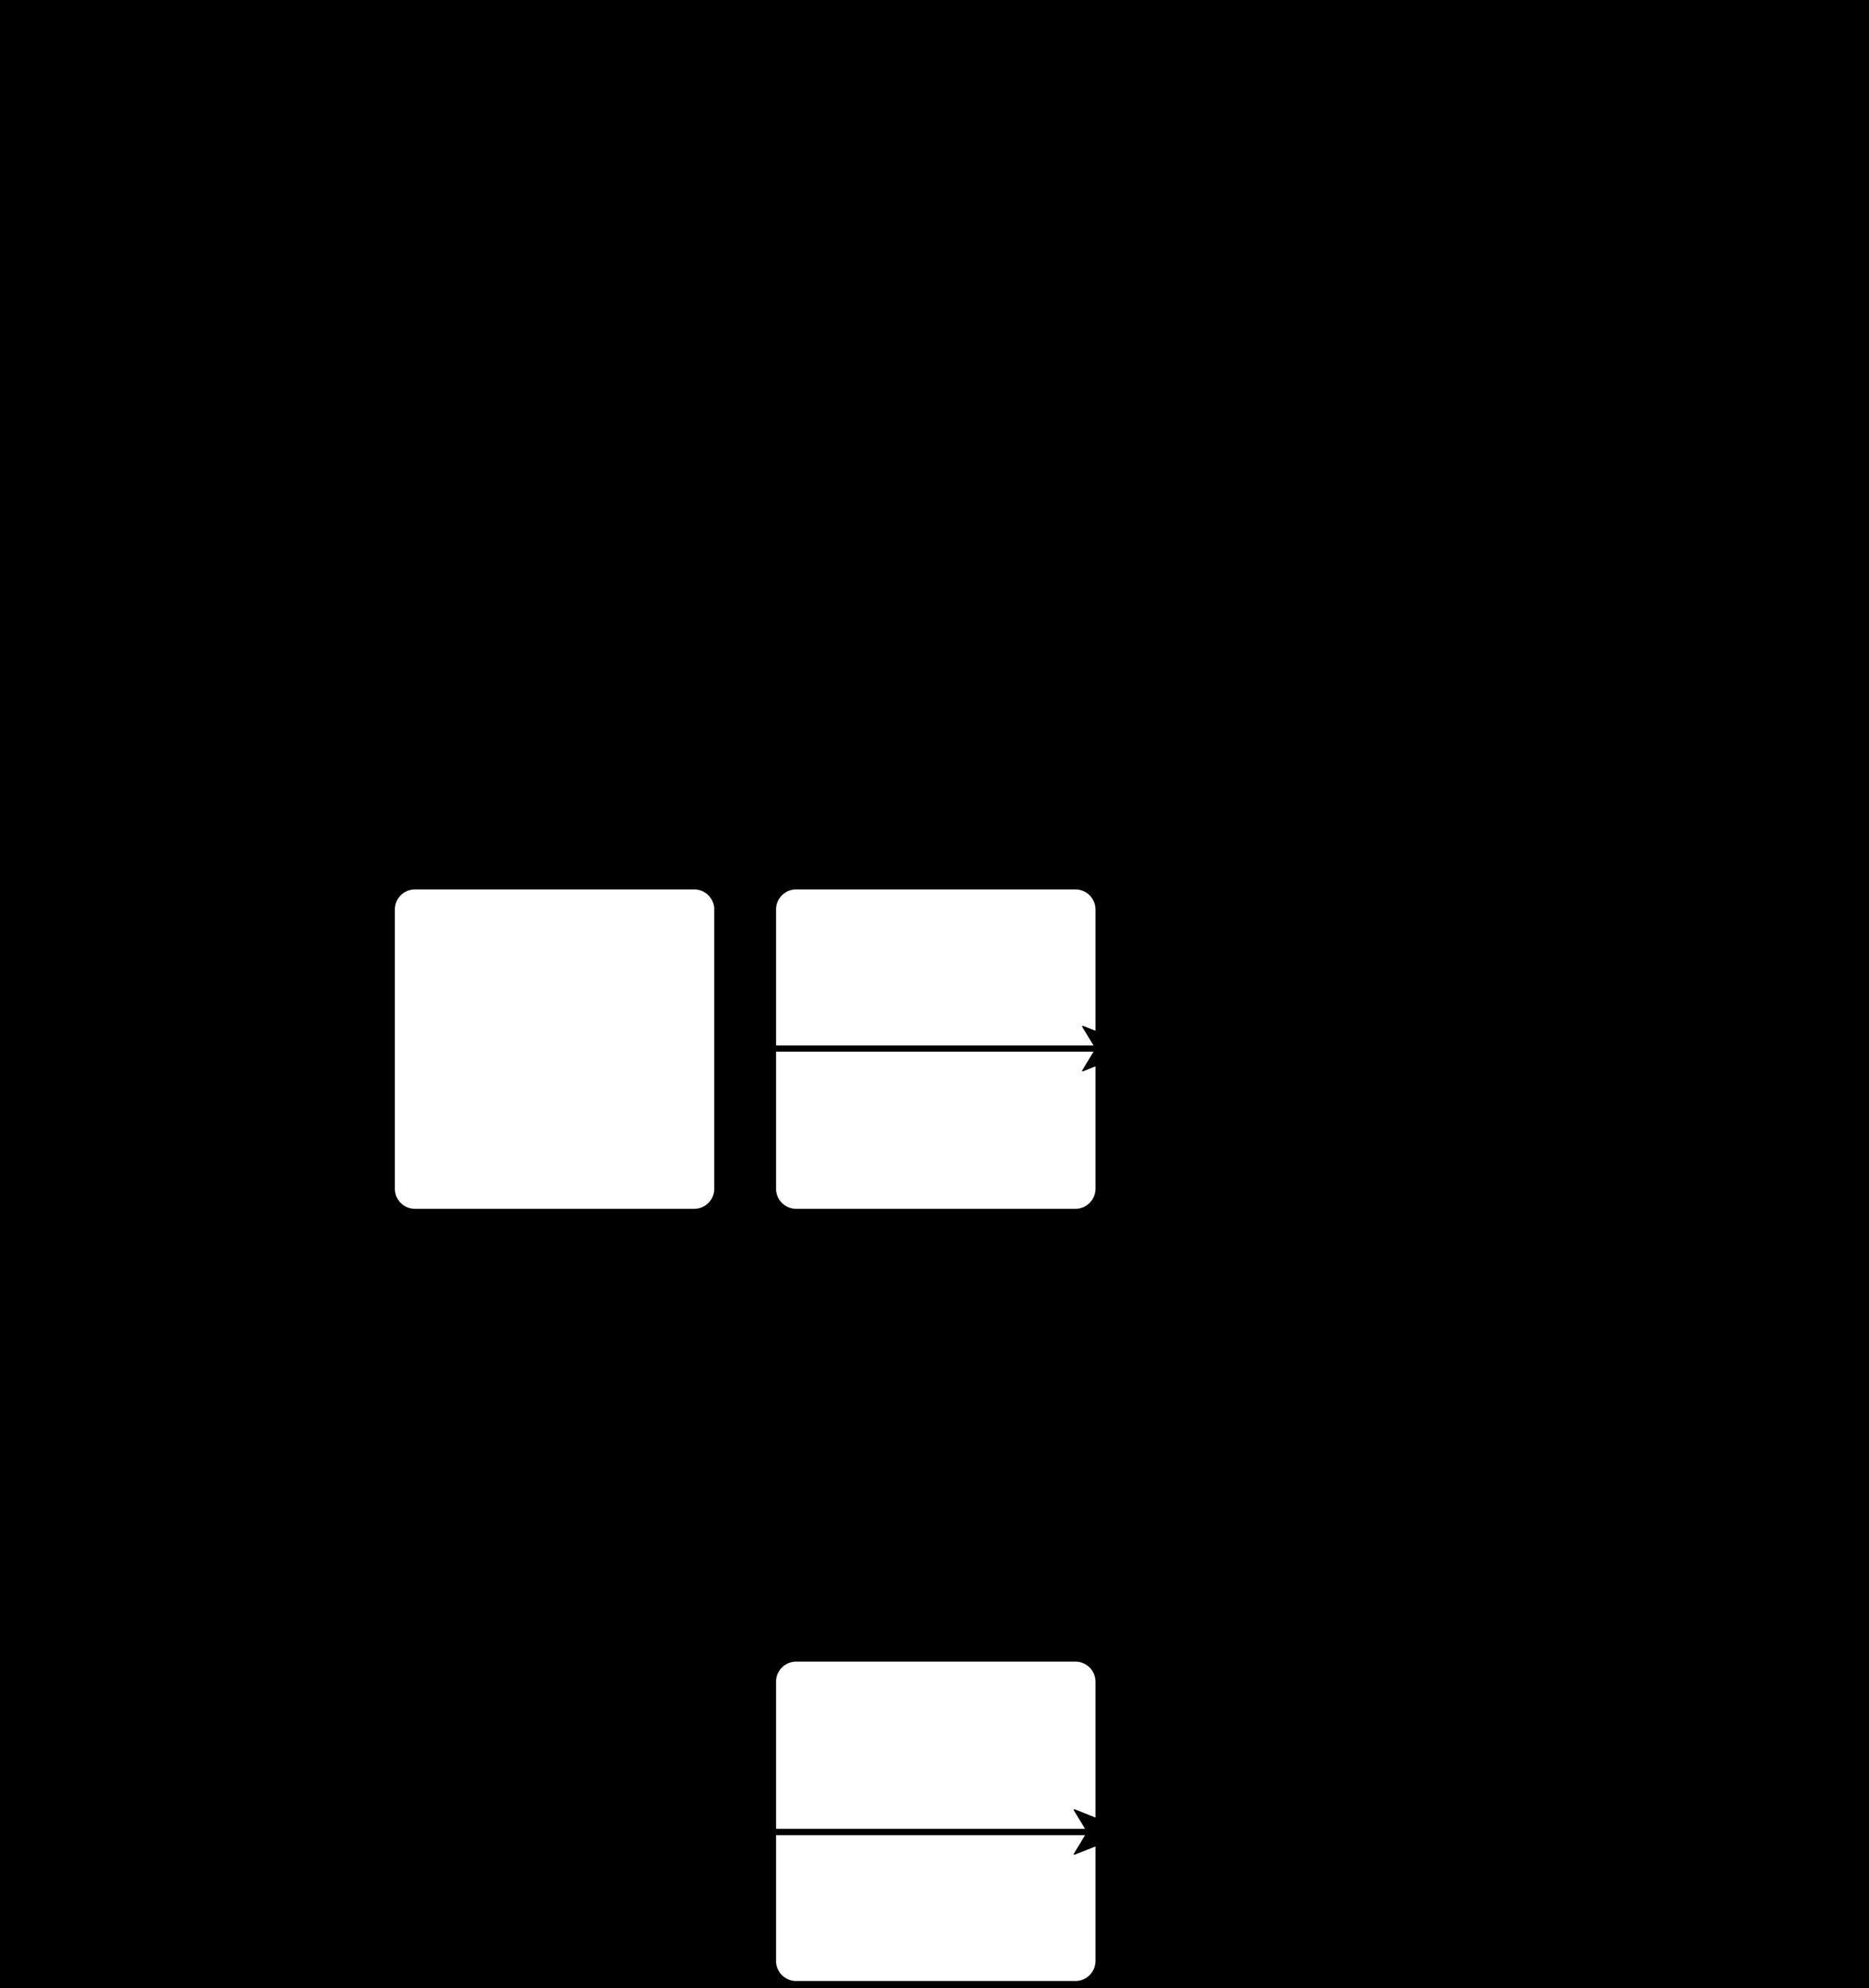 Fig. 1.3: Sweeps.